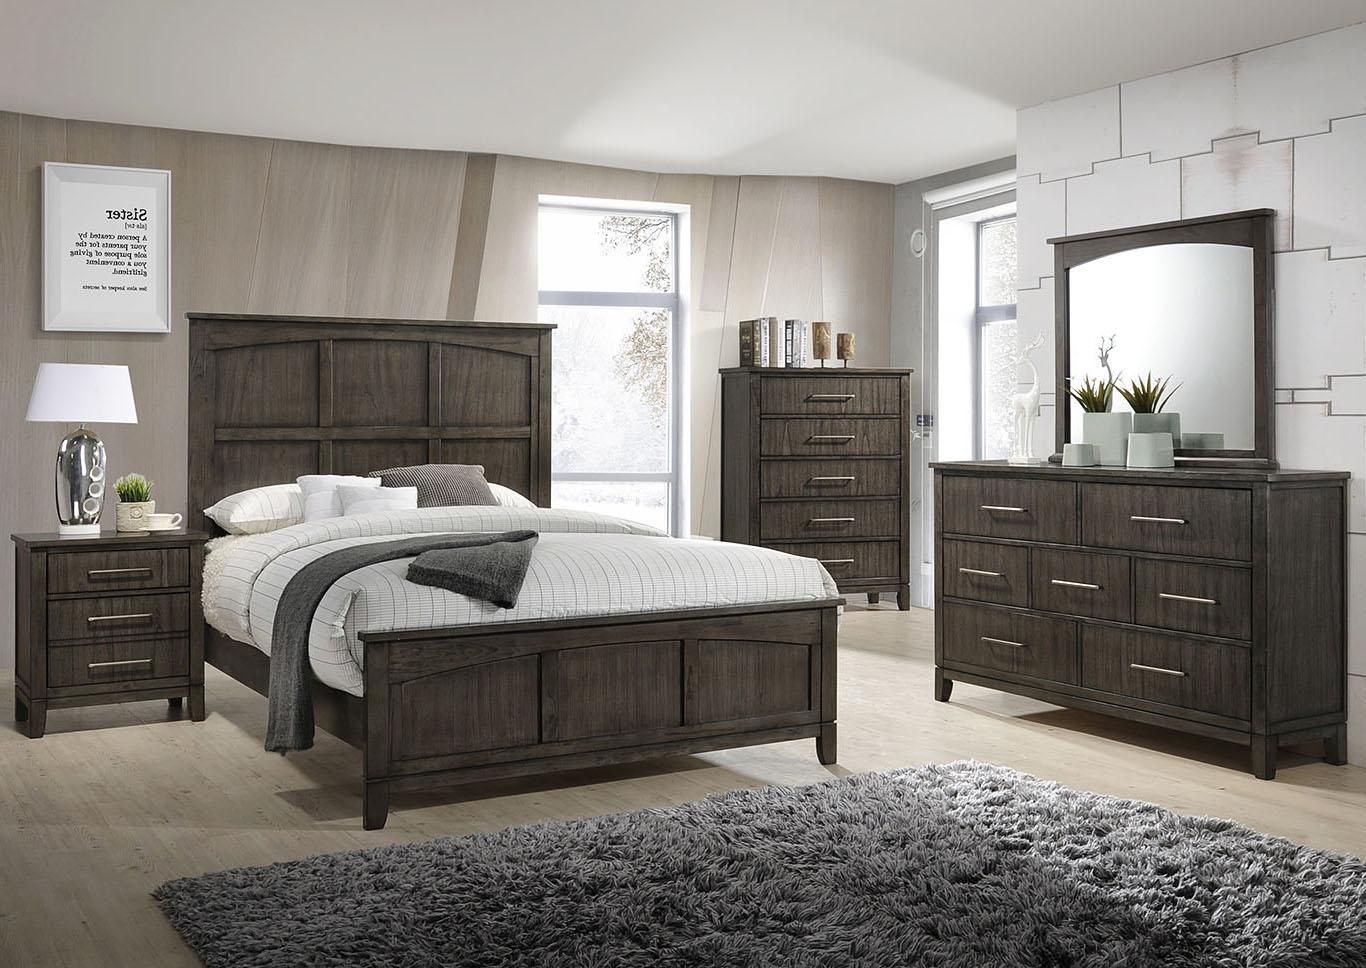 Marlins Furniture: PRESTON KING BED